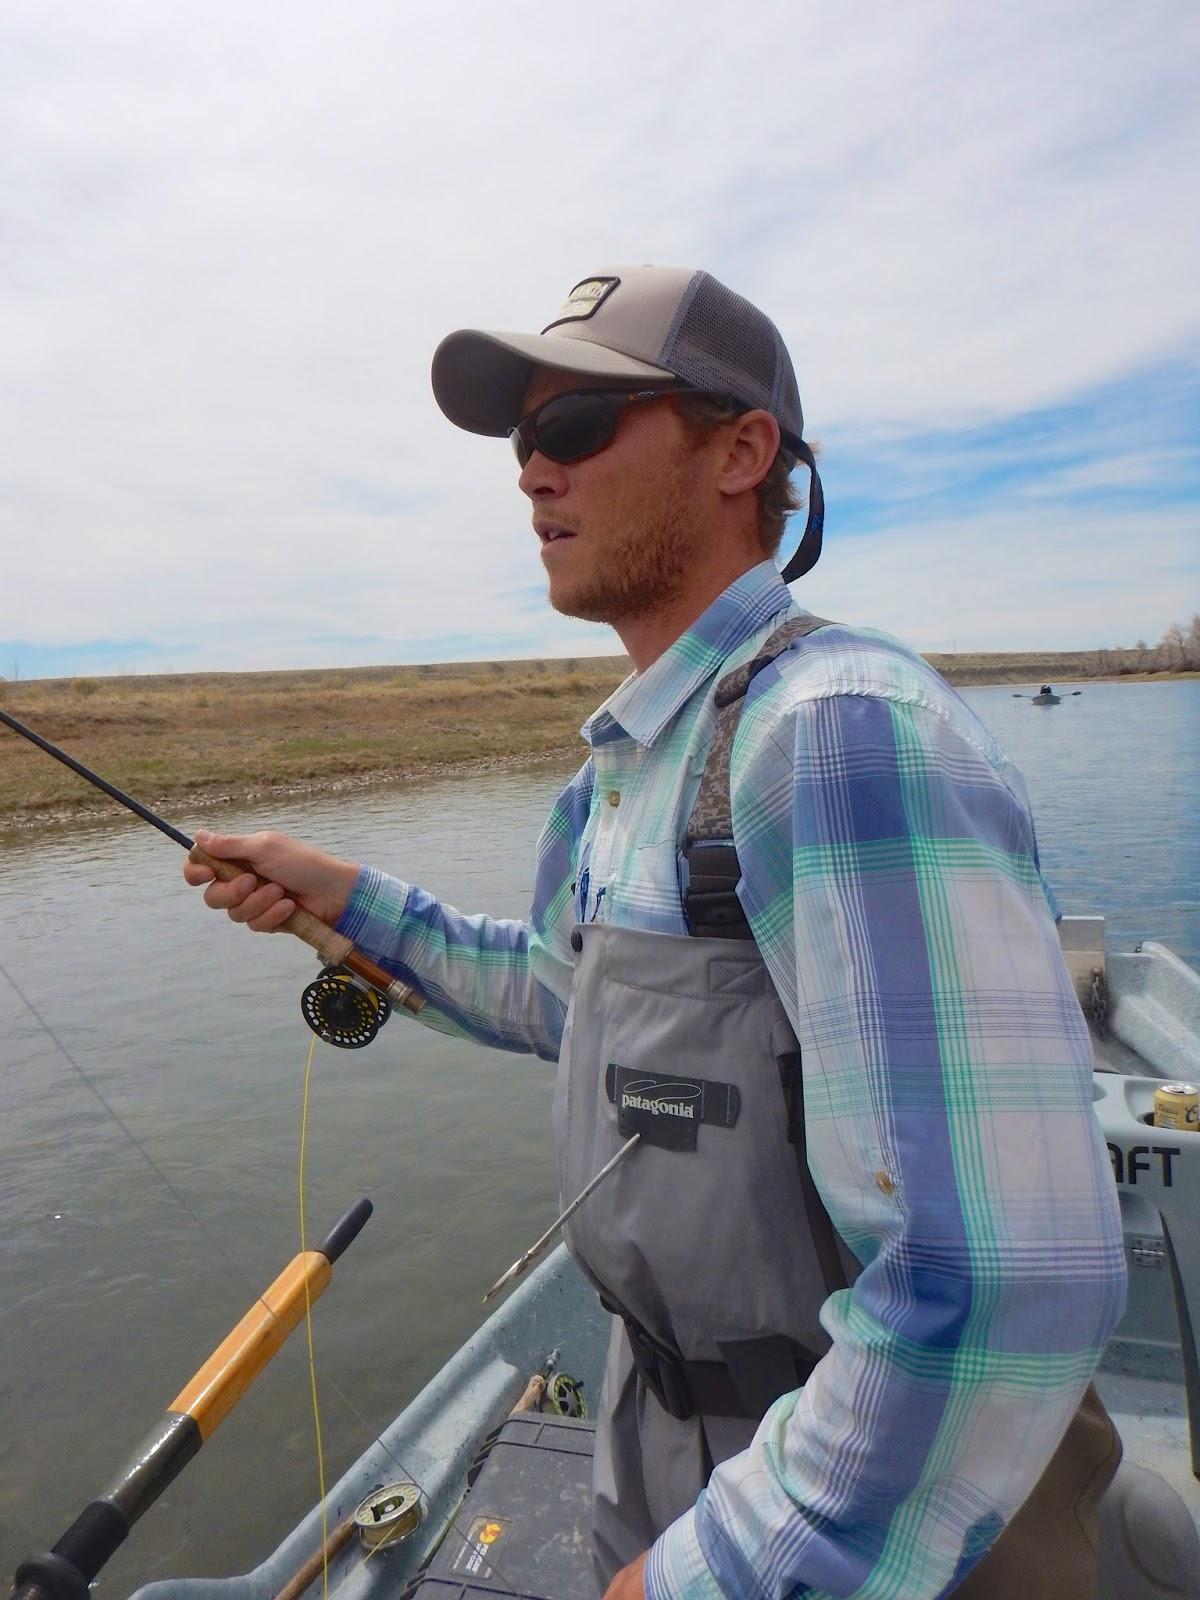 Jackson hole fly fishing report may 3 2016 for Scotts flat lake fishing